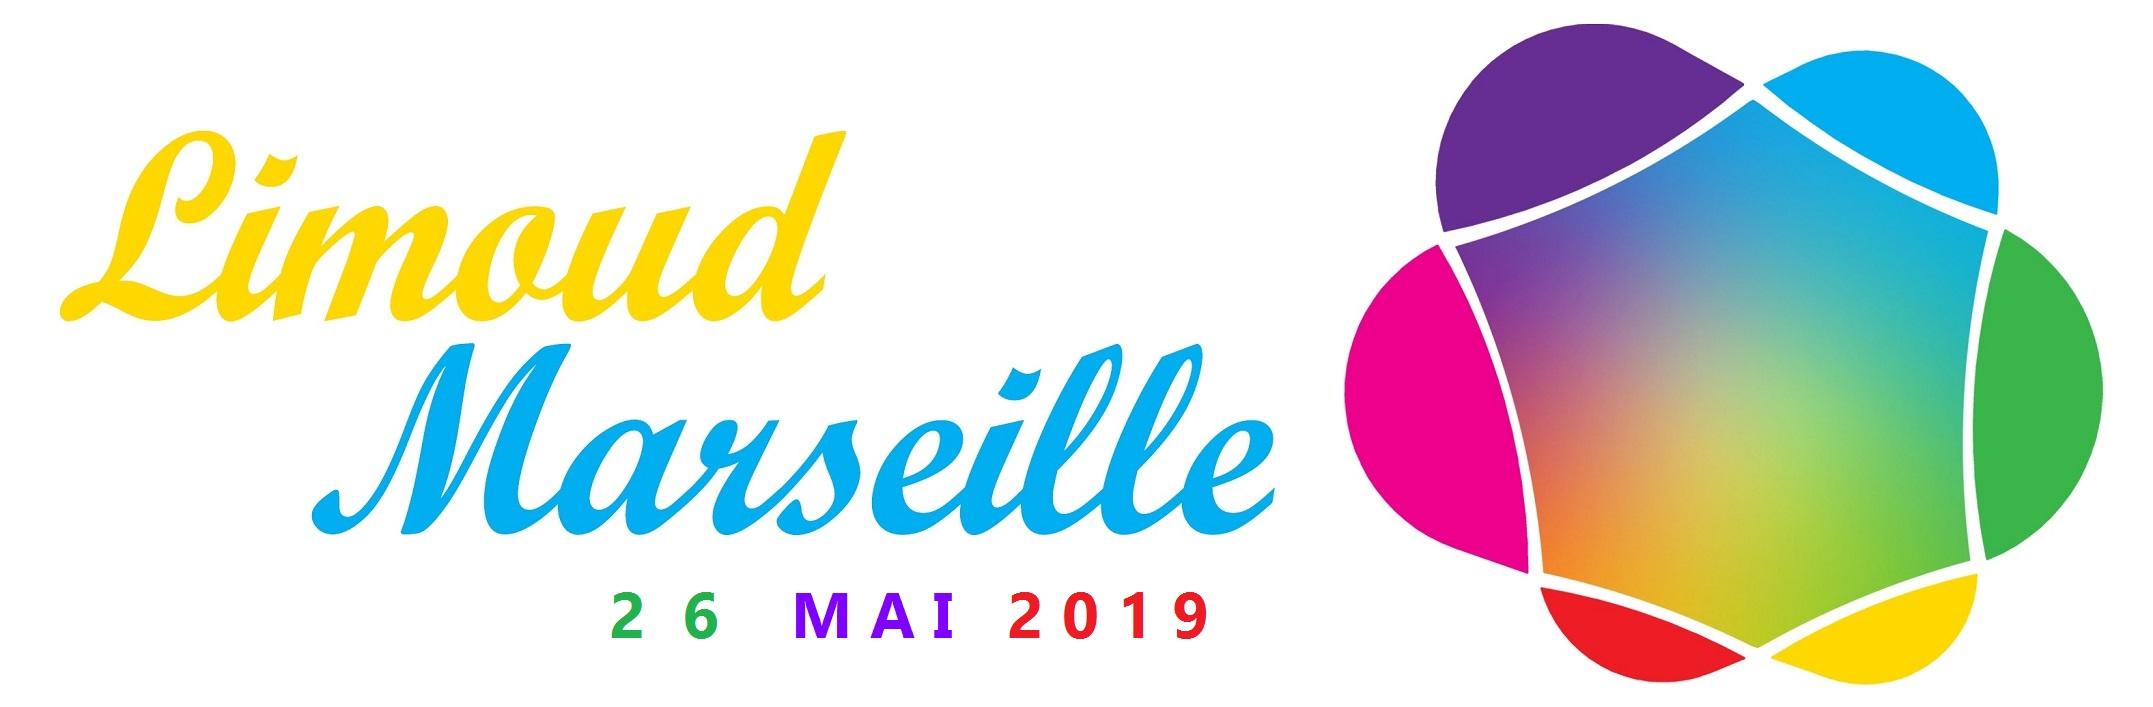 Limoud Marseille 2019 !!!